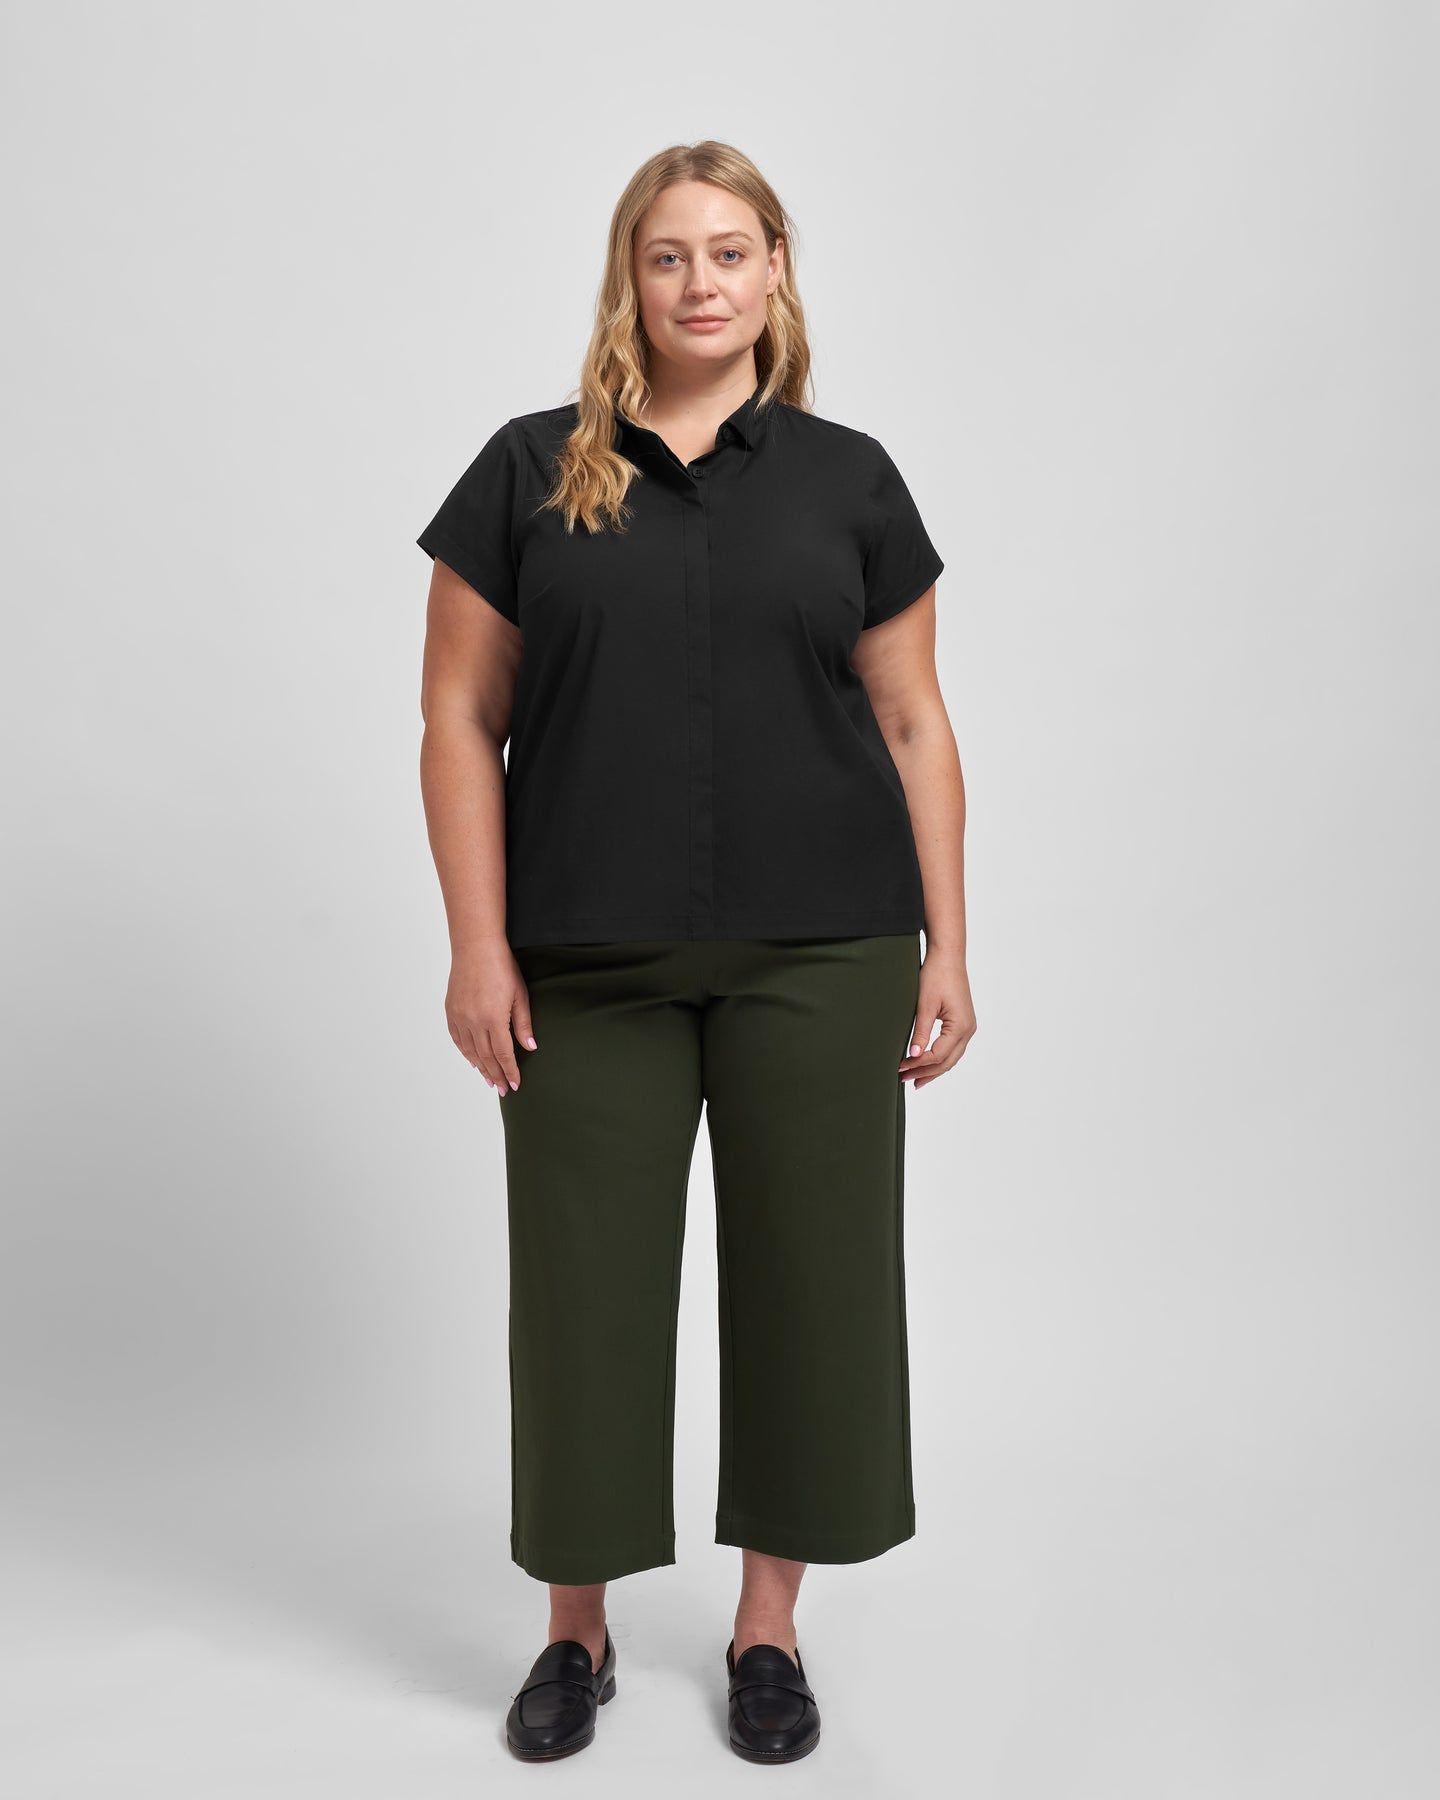 Aster Tuxedo Collar Shirt - Black - image 0